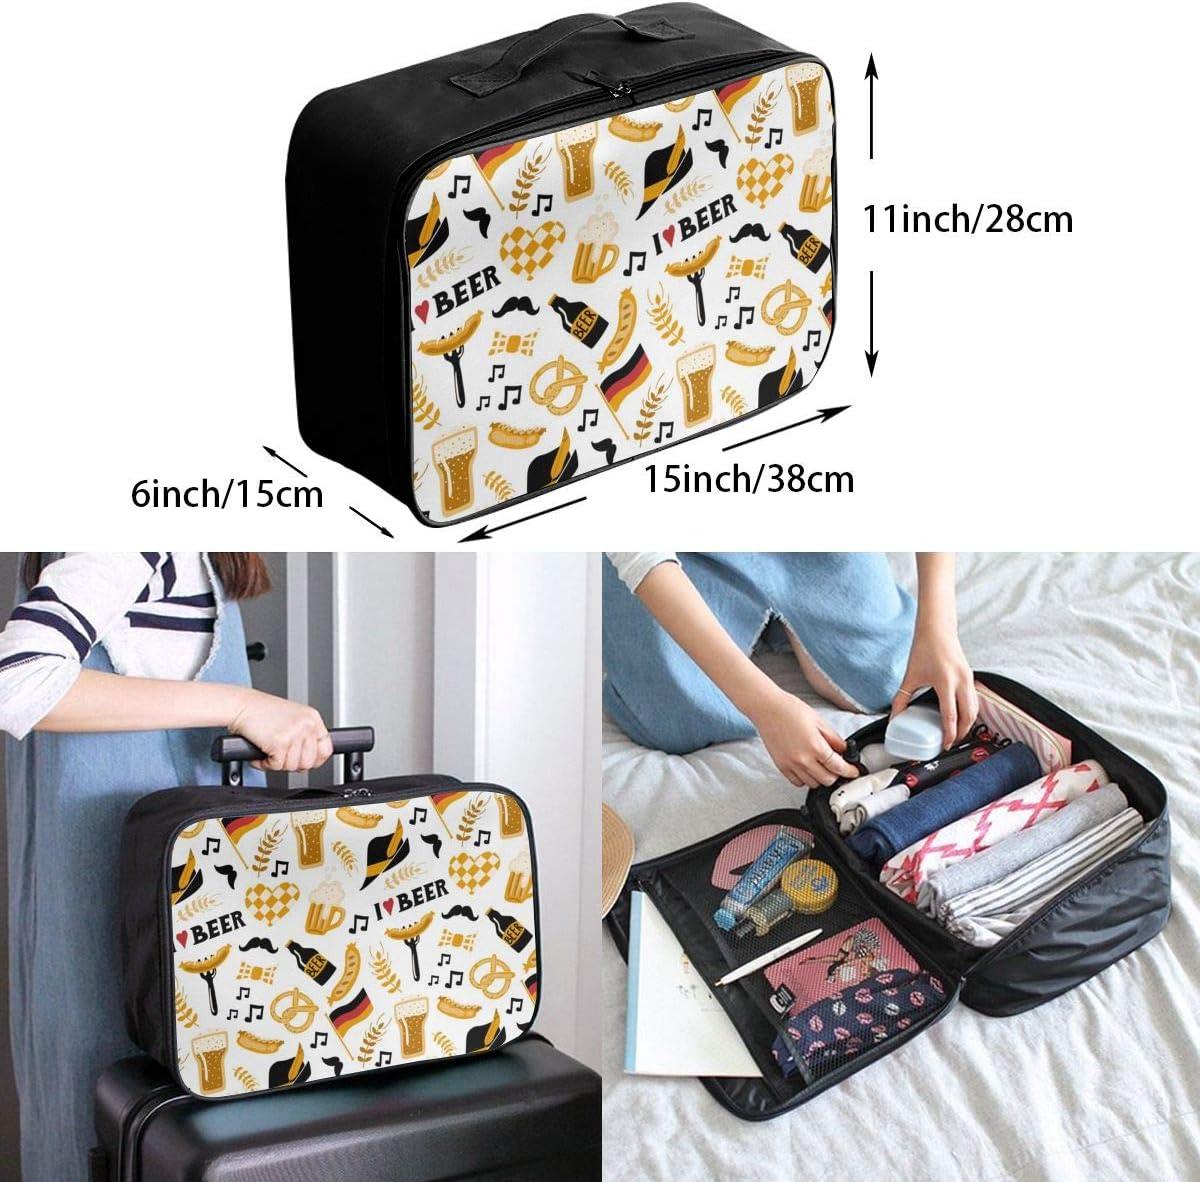 Oktoberfest Beer Pattern Lightweight LargeTravel Storage Luggage Trolley Bag Travel Duffel Bags Carry-On Tote